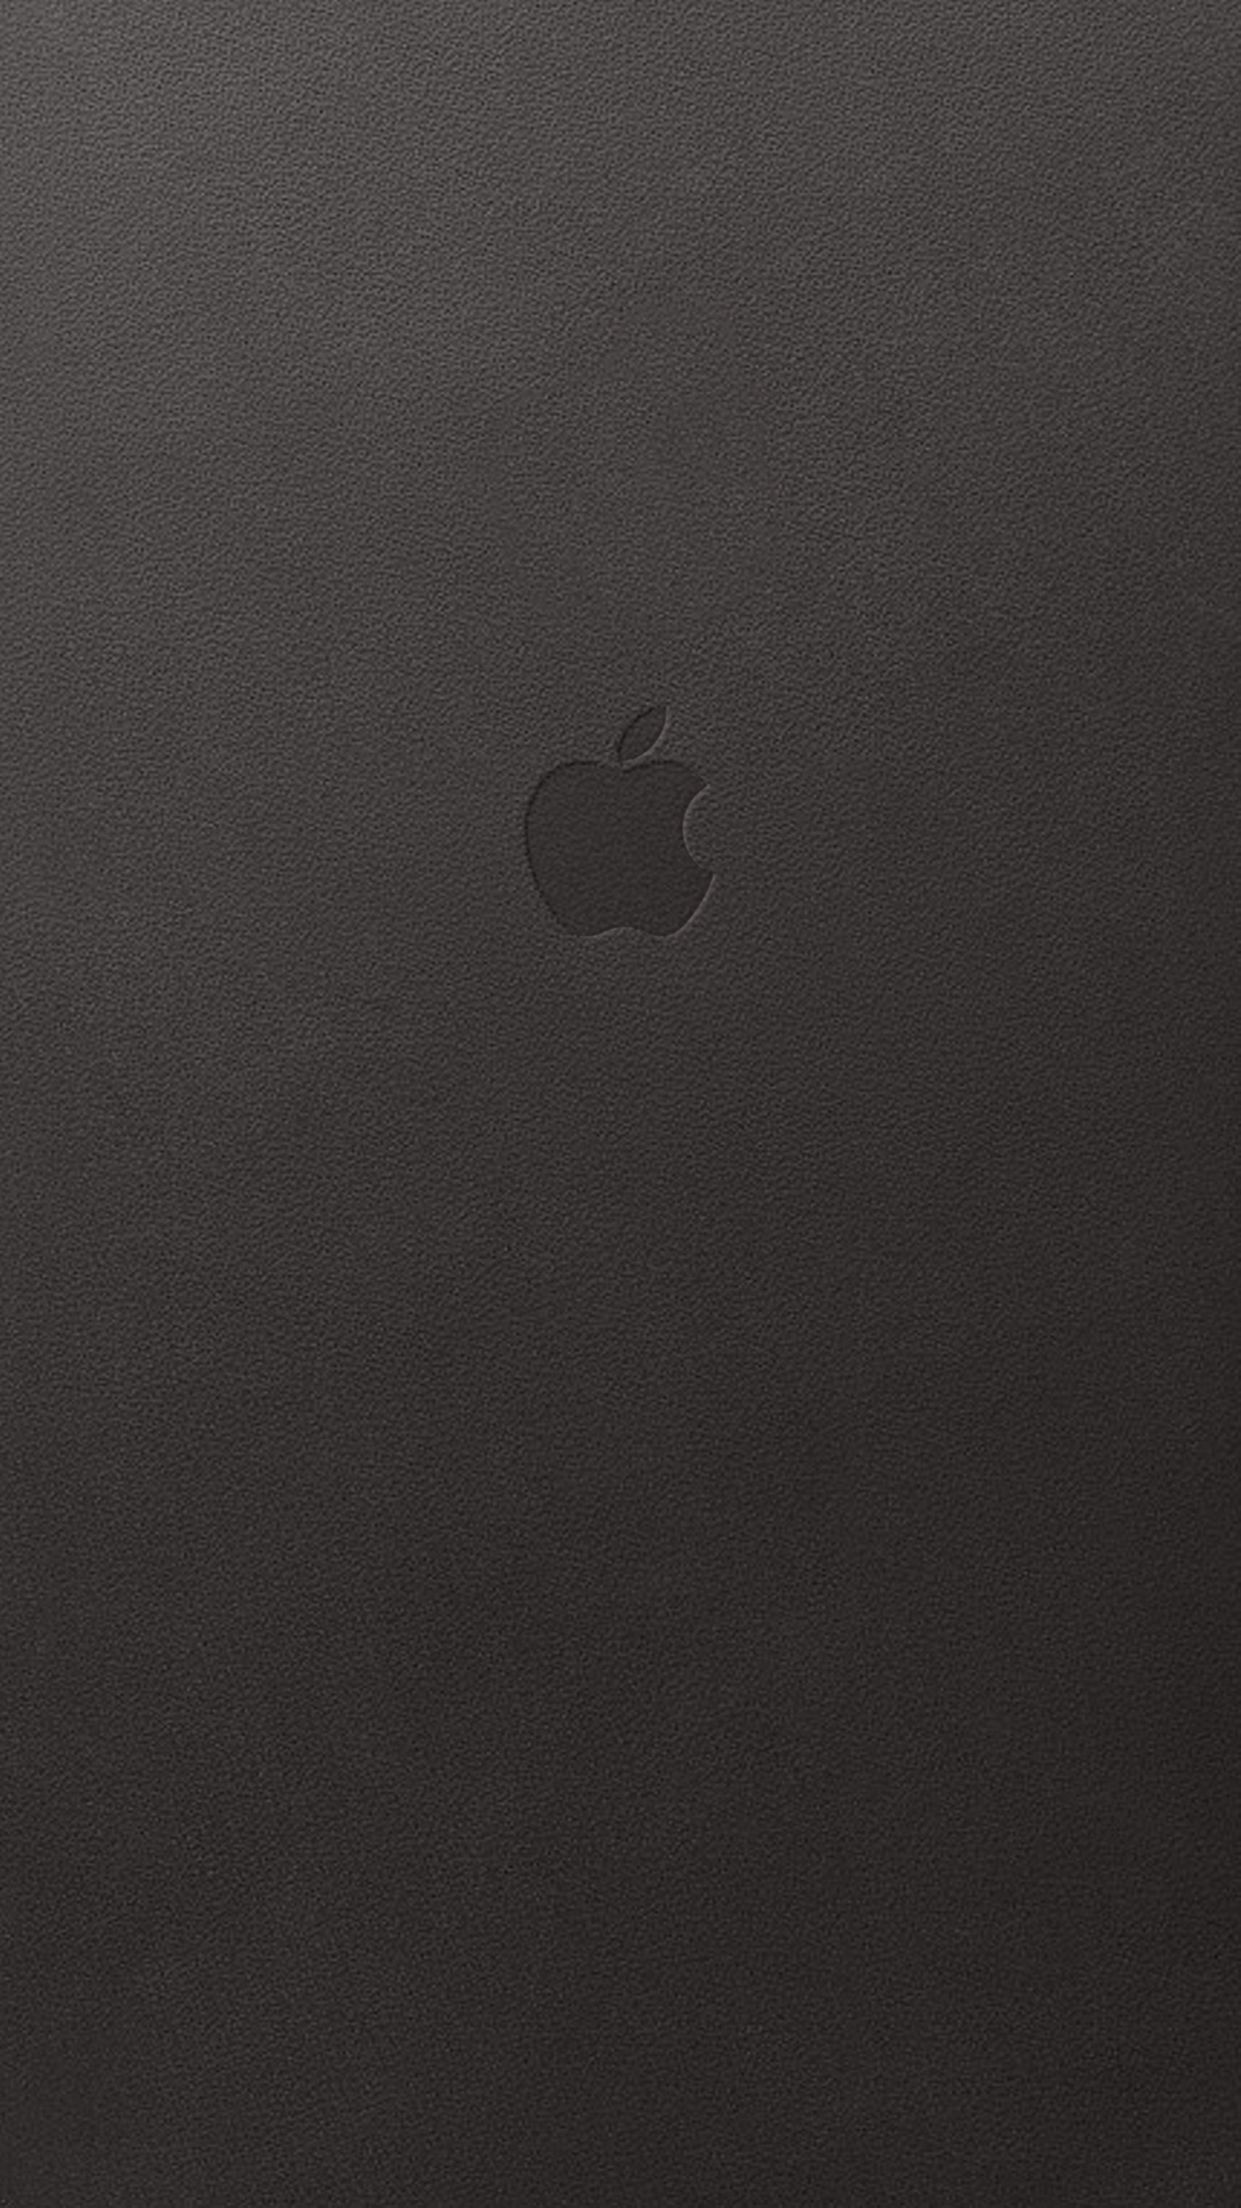 Iphone 6s Plus Wallpaper Black Apple Logo Wallpaper Iphone Wallpaper Apple Wallpaper